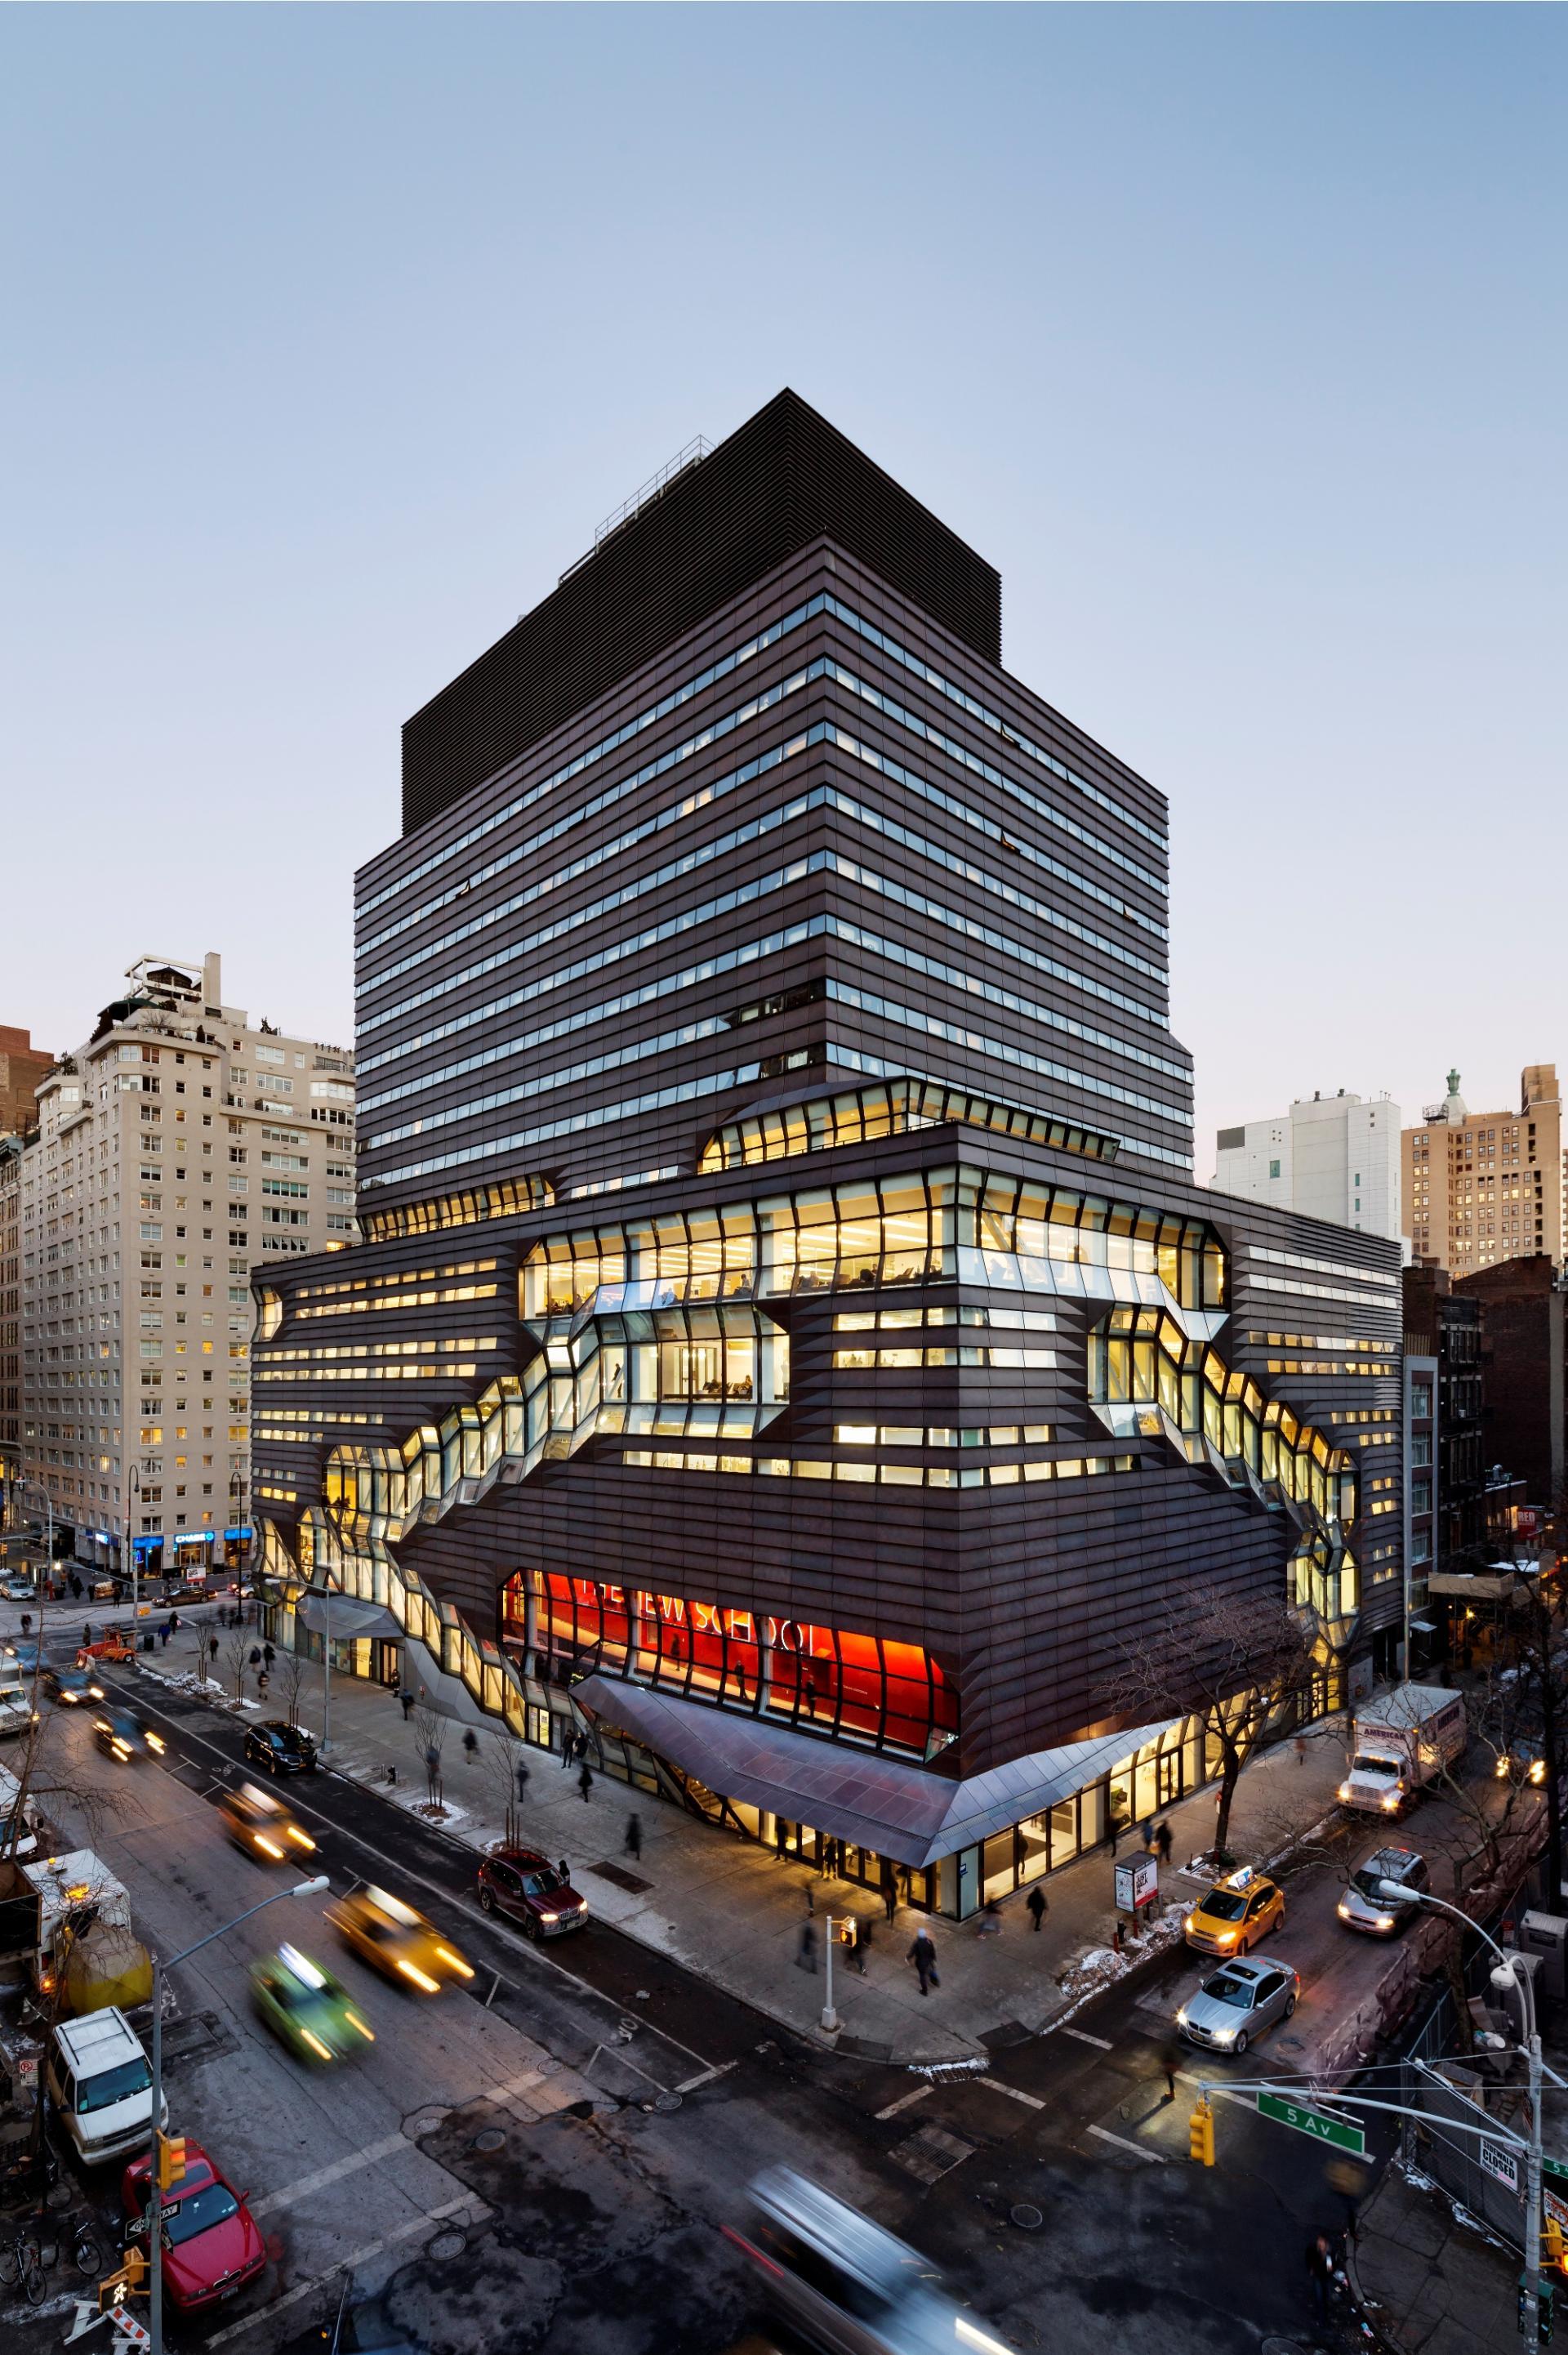 Учебный центр университета Greenwich Village